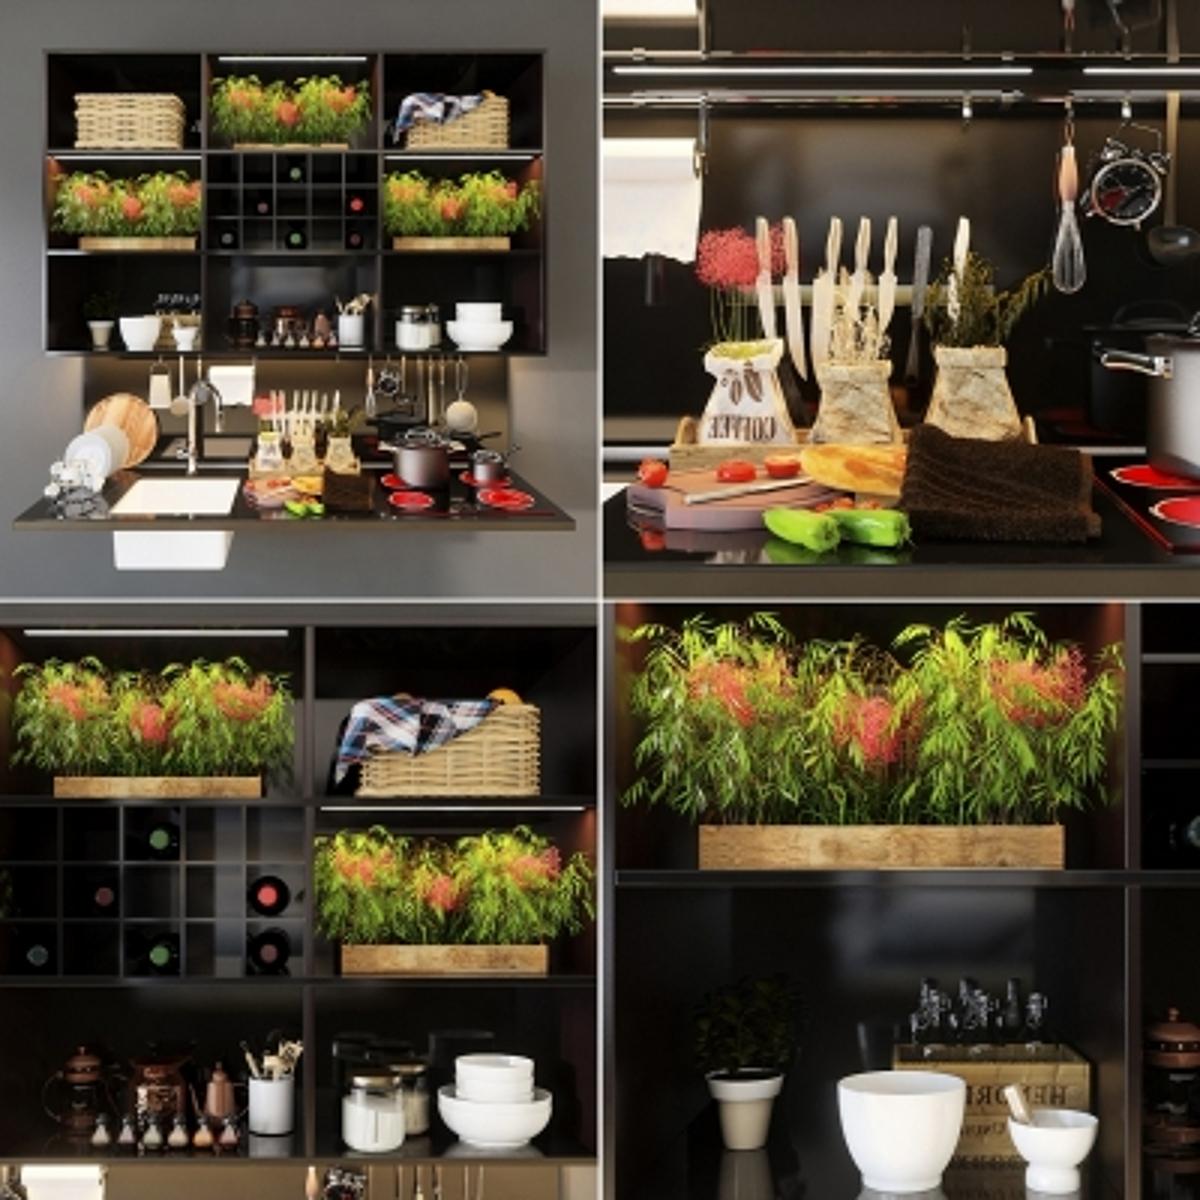 cg233现代橱柜厨房器具摆件组合模型